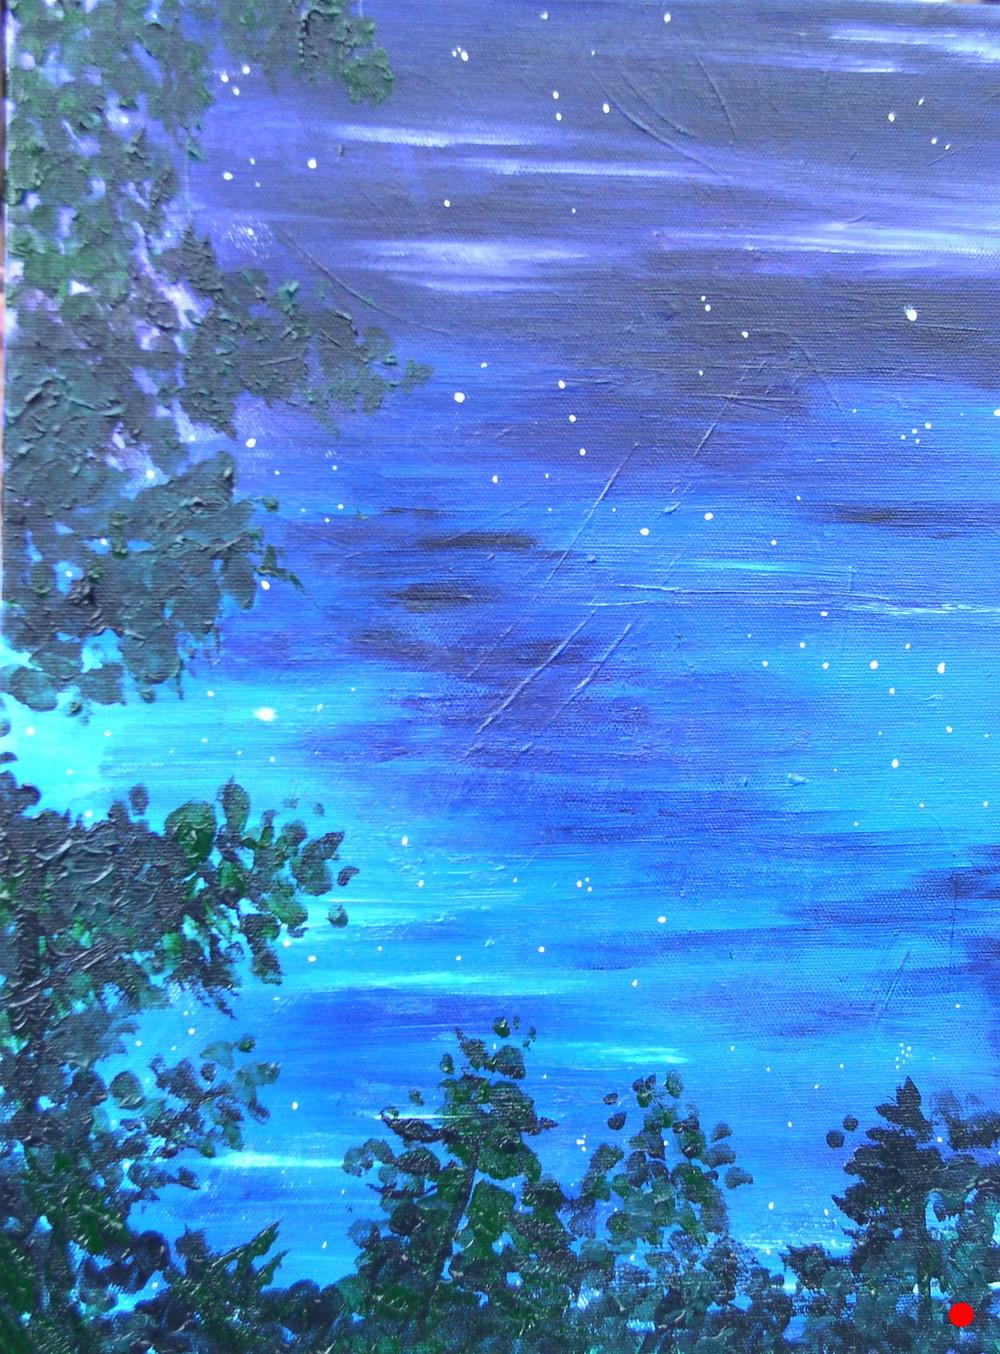 Night Sky 16x12.jpg